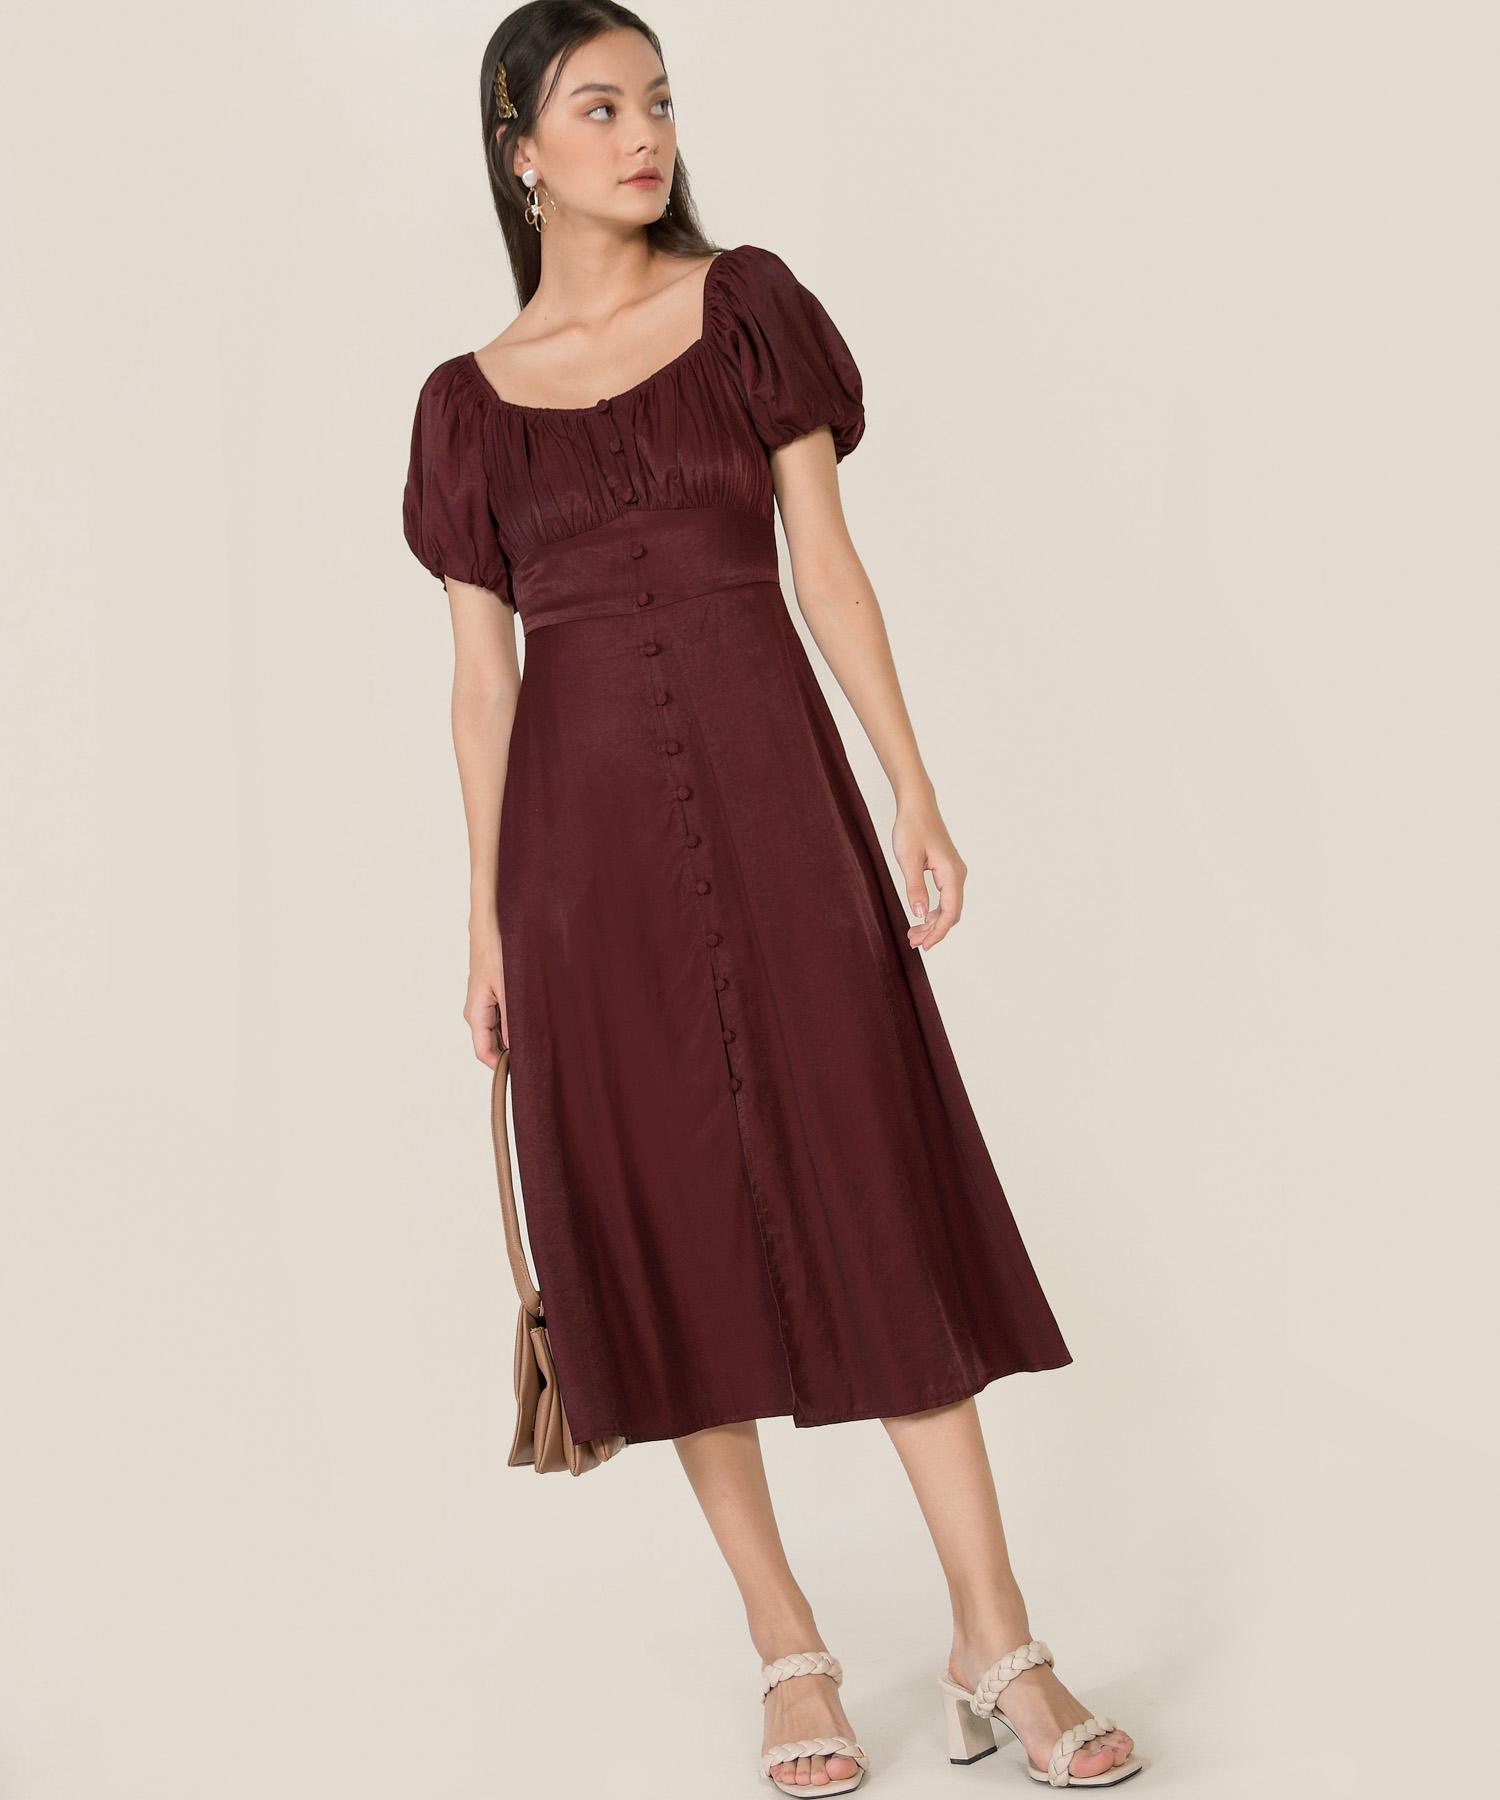 antilia-ruched-button-down-midi-dress-mahogany-2